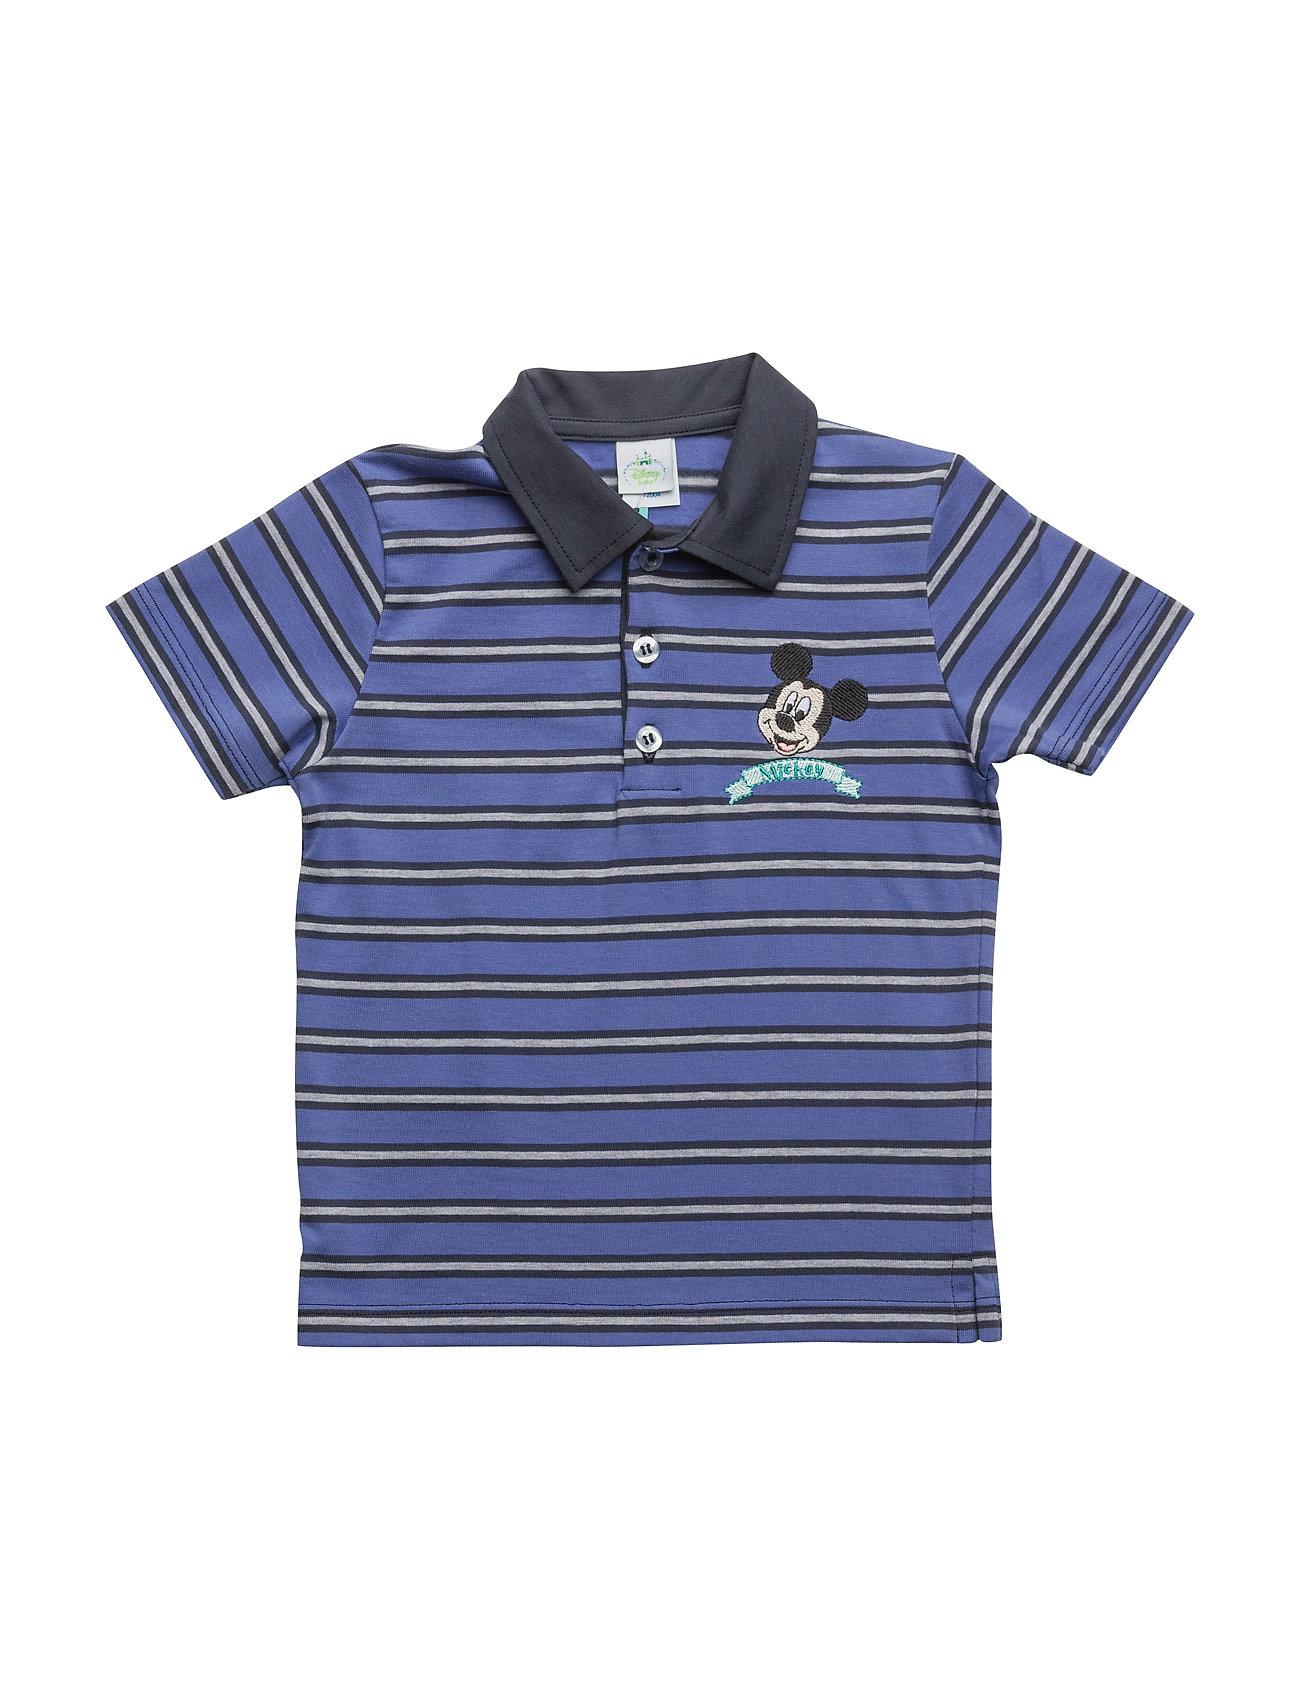 Poloshirt Disney Kortærmede t-shirts til Børn i Mørkeblå